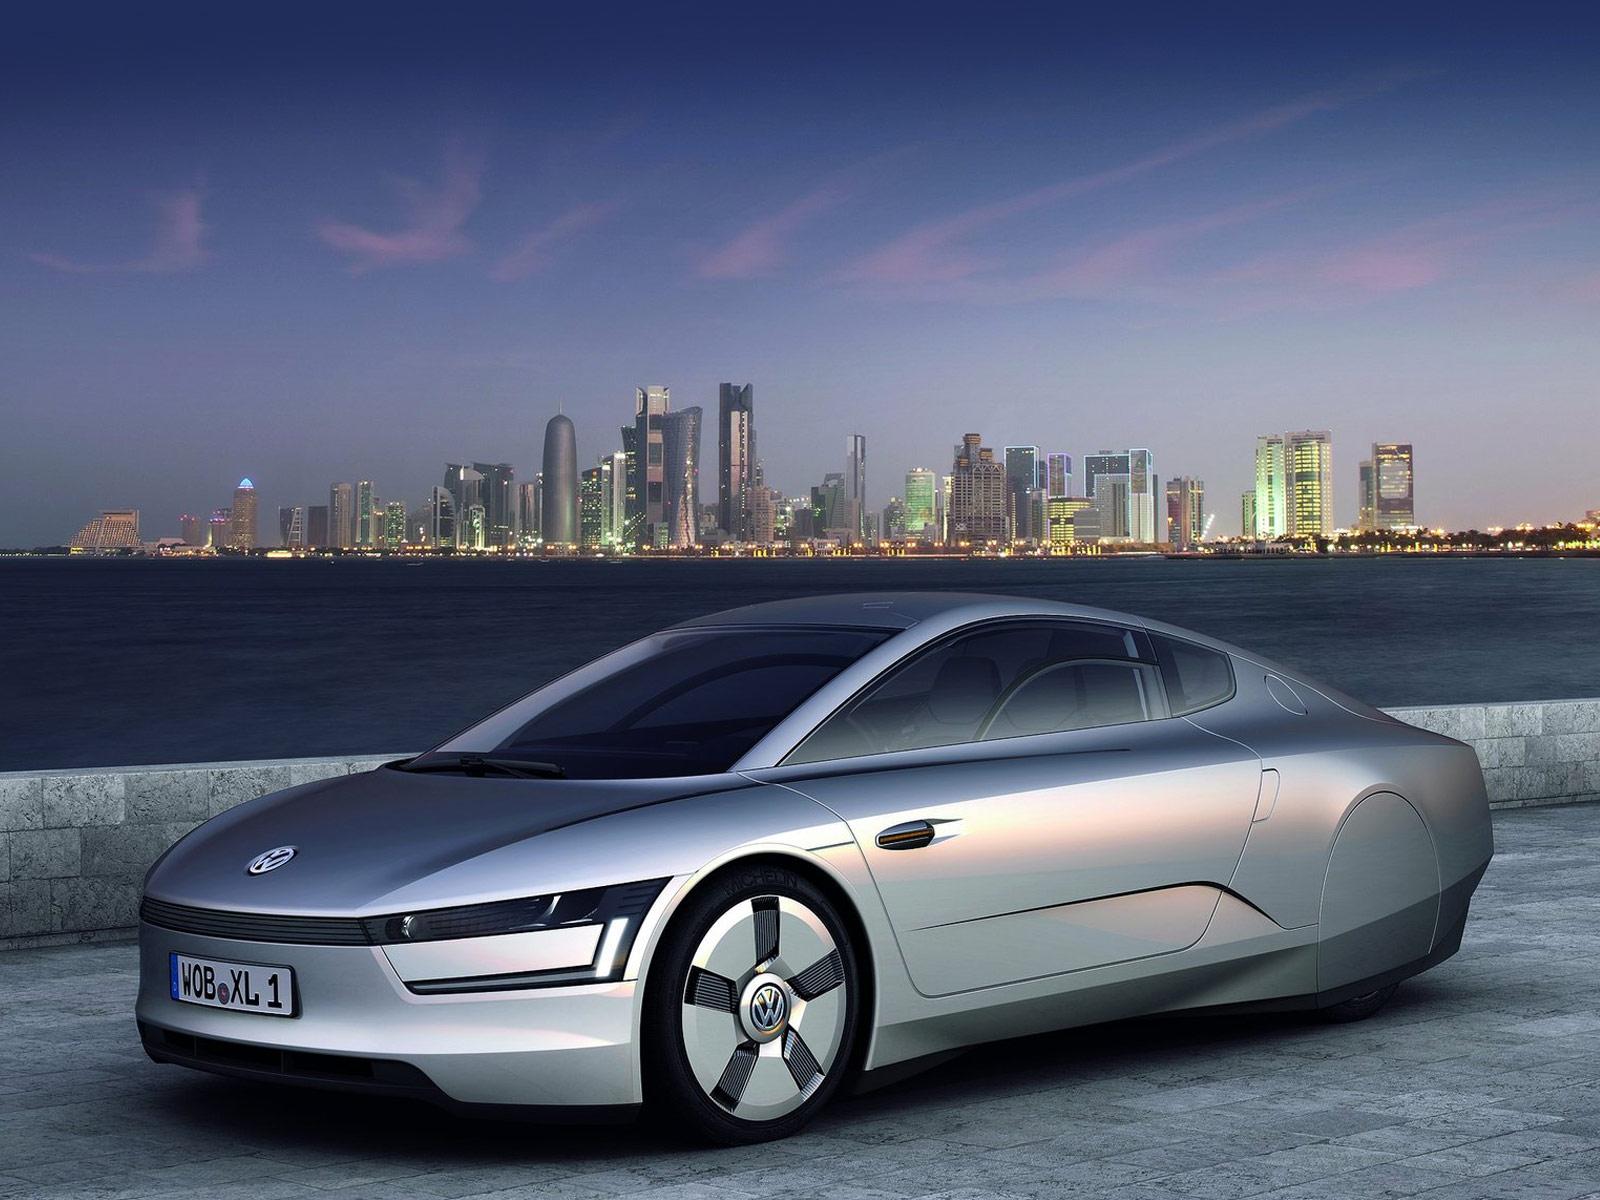 2011 volkswagen xl1 concept car desktop wallpapers auto trends magazine. Black Bedroom Furniture Sets. Home Design Ideas